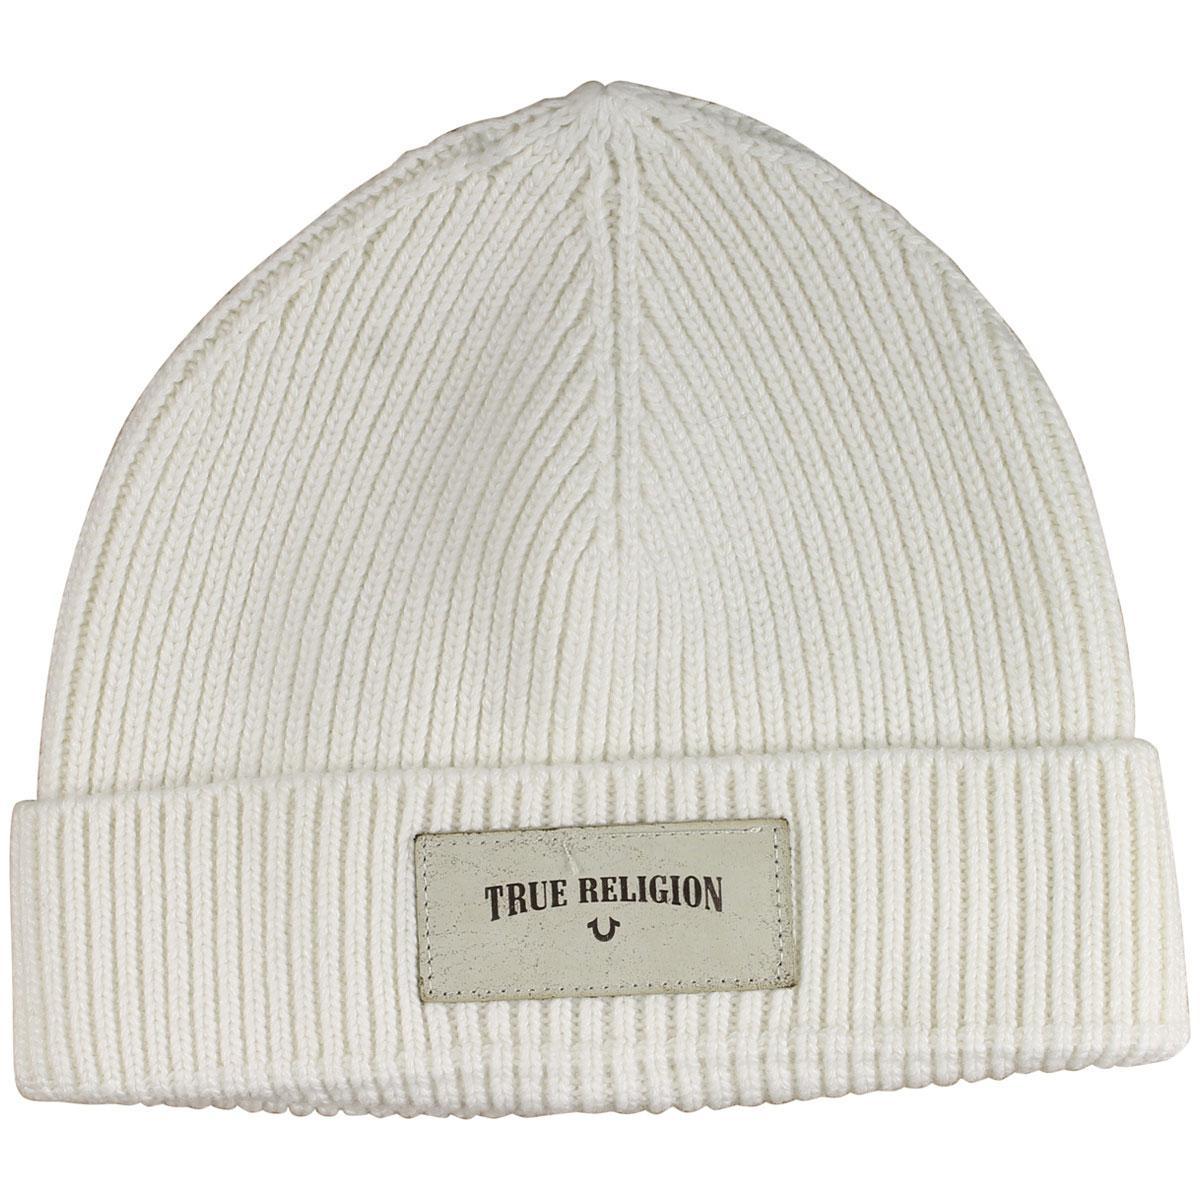 True Religion Men's Ribbed Knit Watchcap Hat